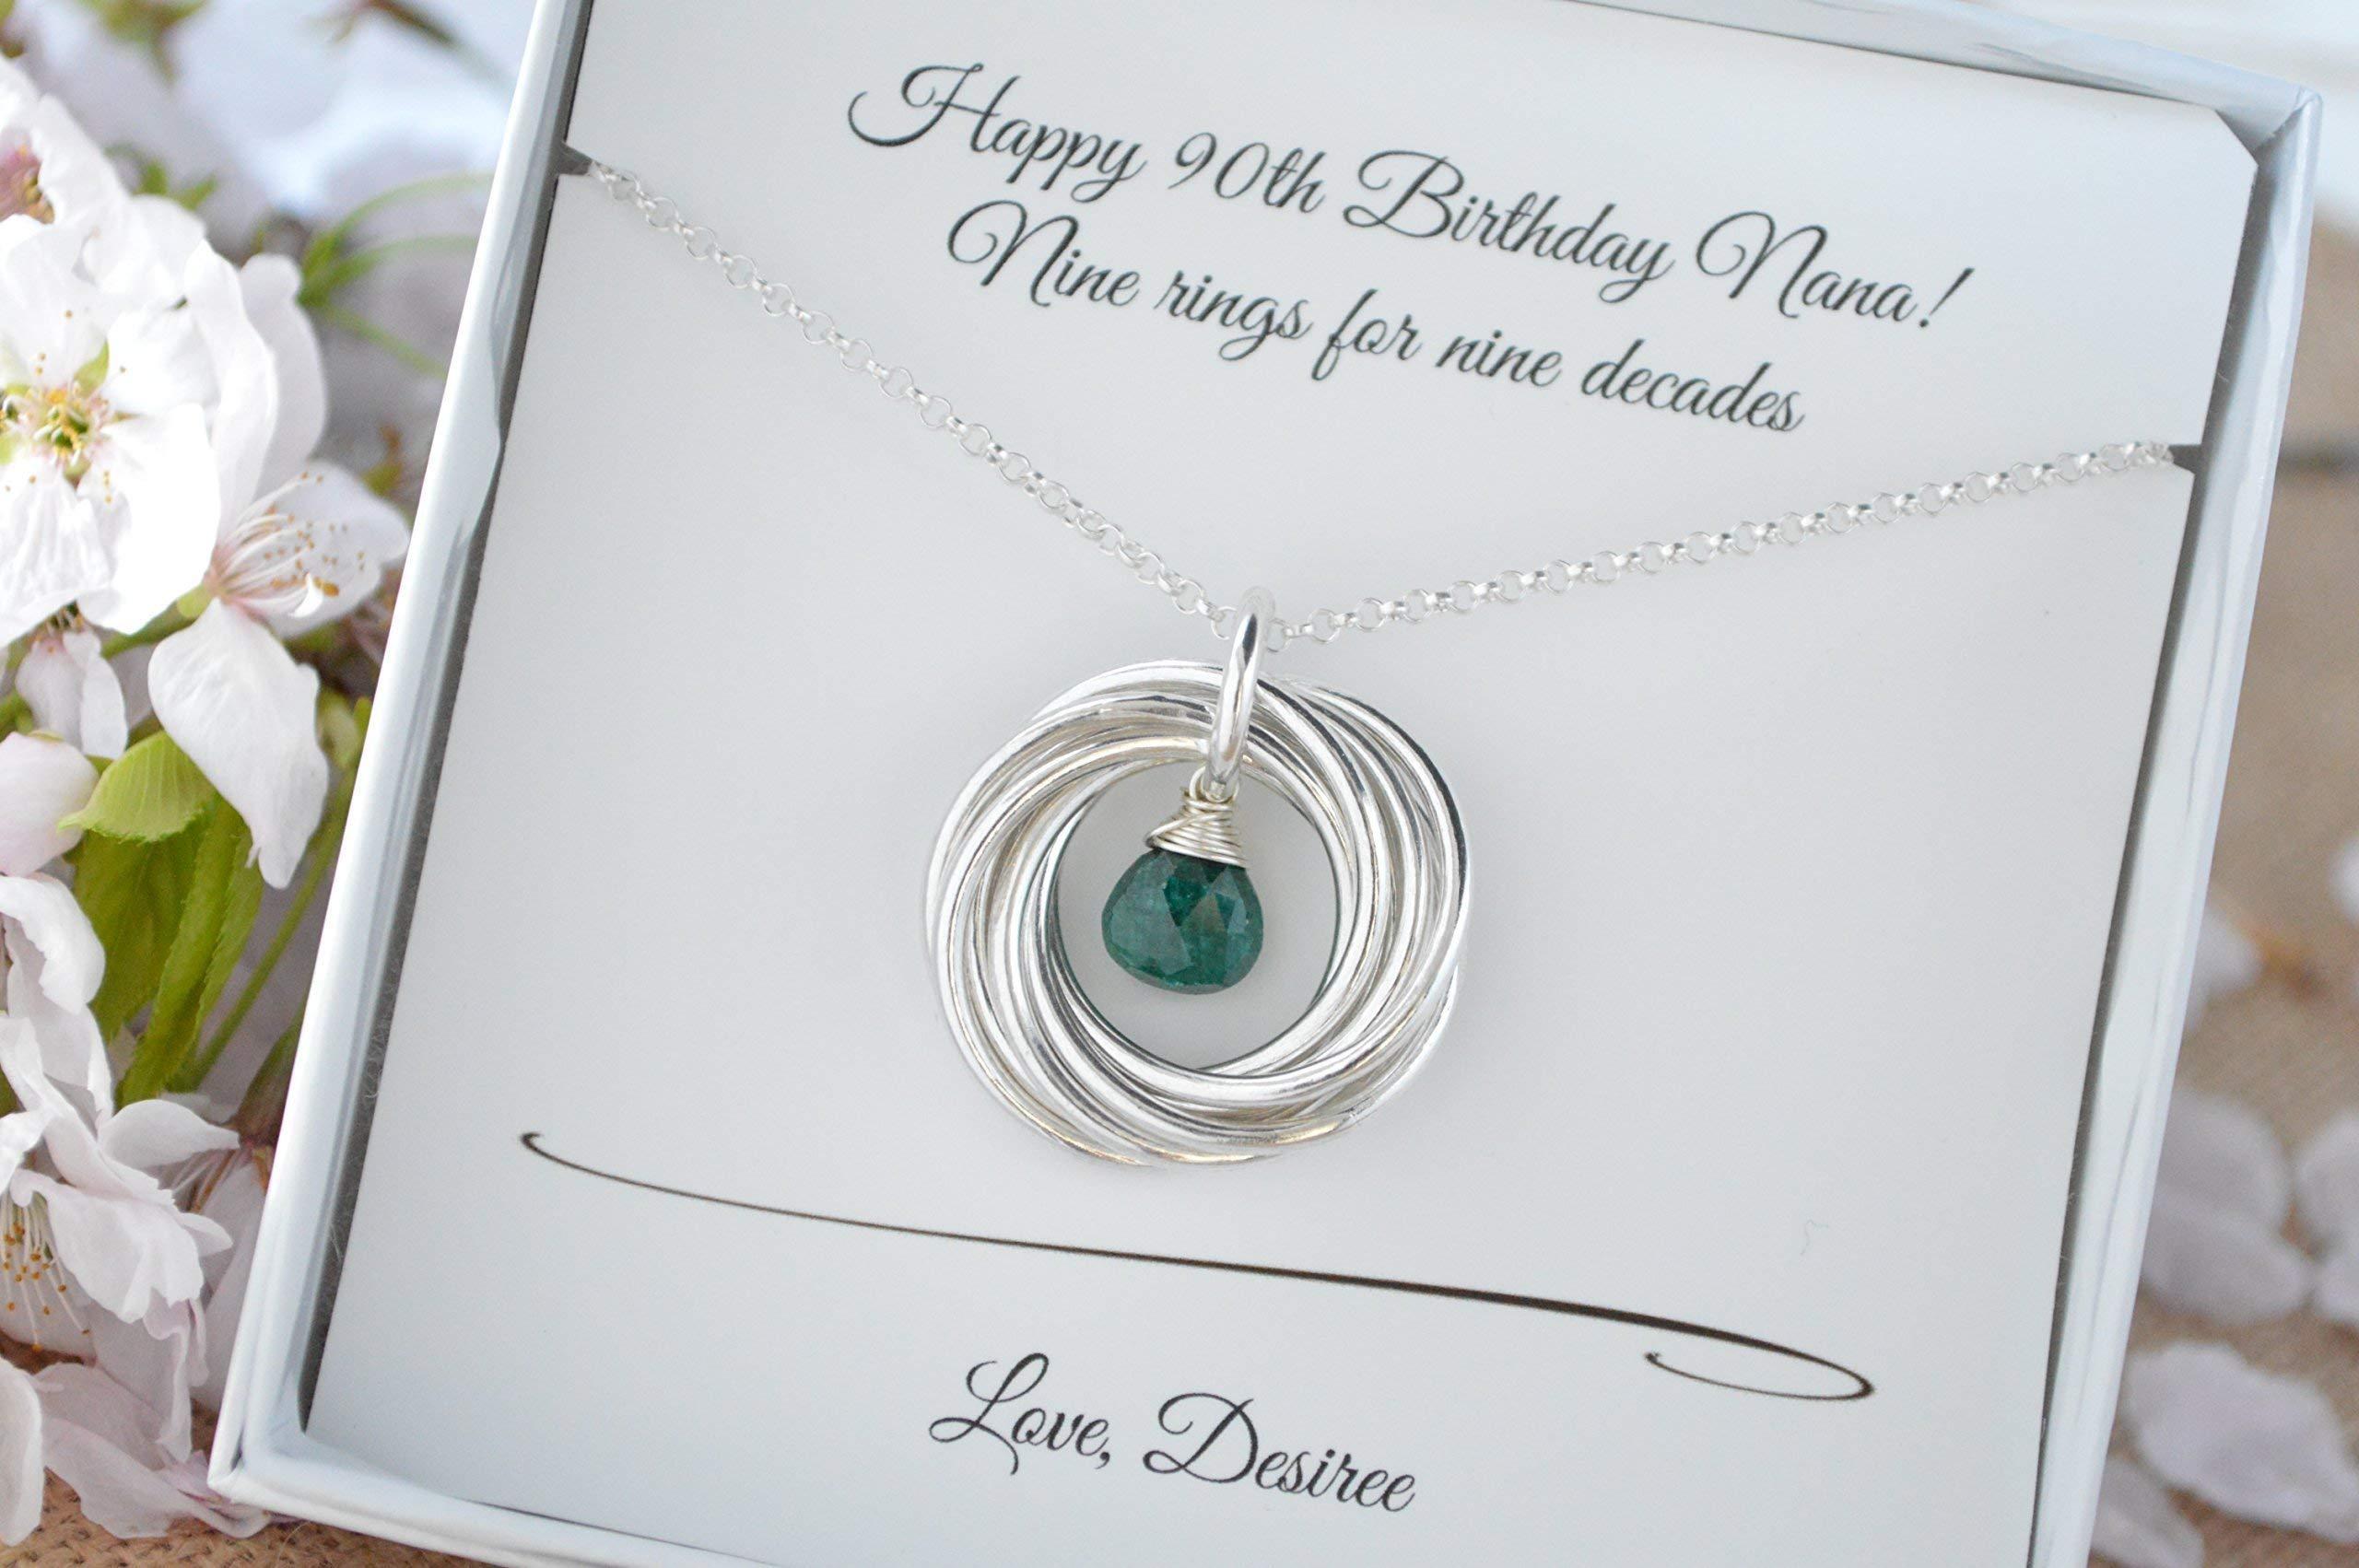 90th Birthday Gift For Mom And Grandma 9 Rings Interlocking Necklace May Birthstone Emerald